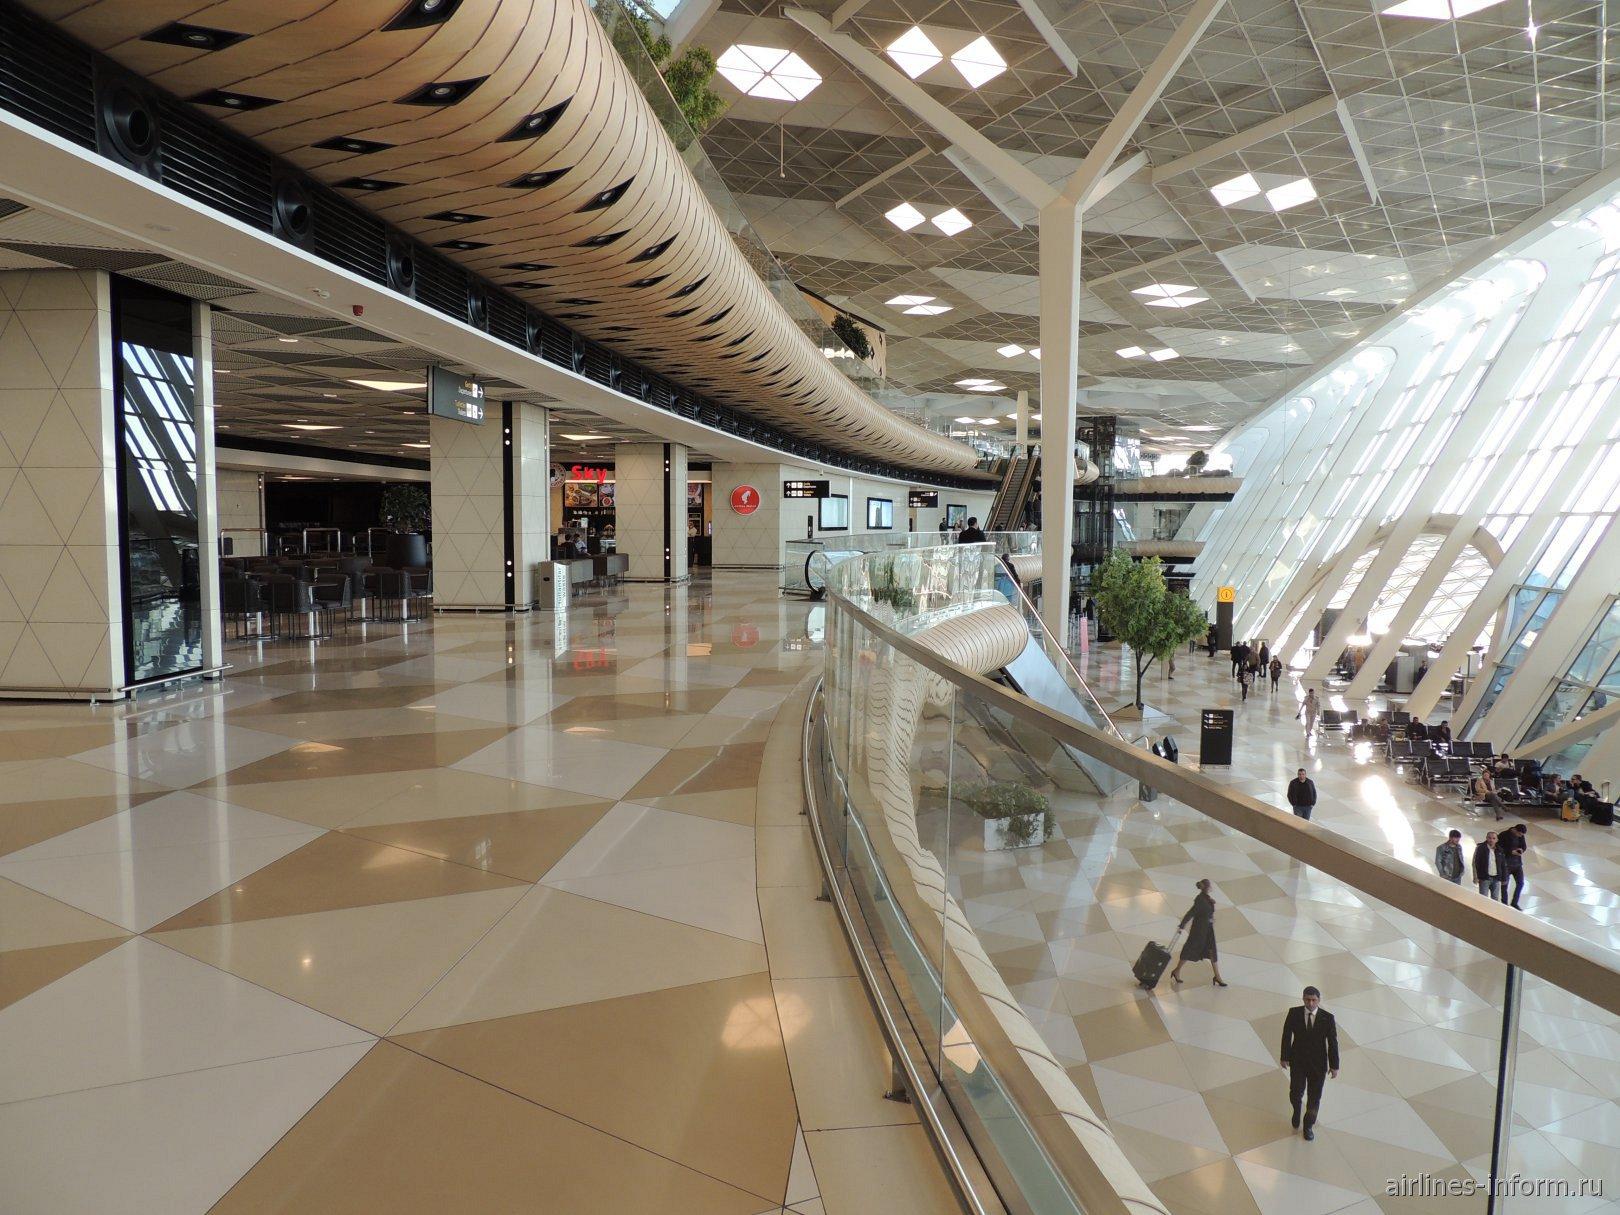 На 2-м этаже терминала 1 аэропорта Баку имени Гейдара Алиева